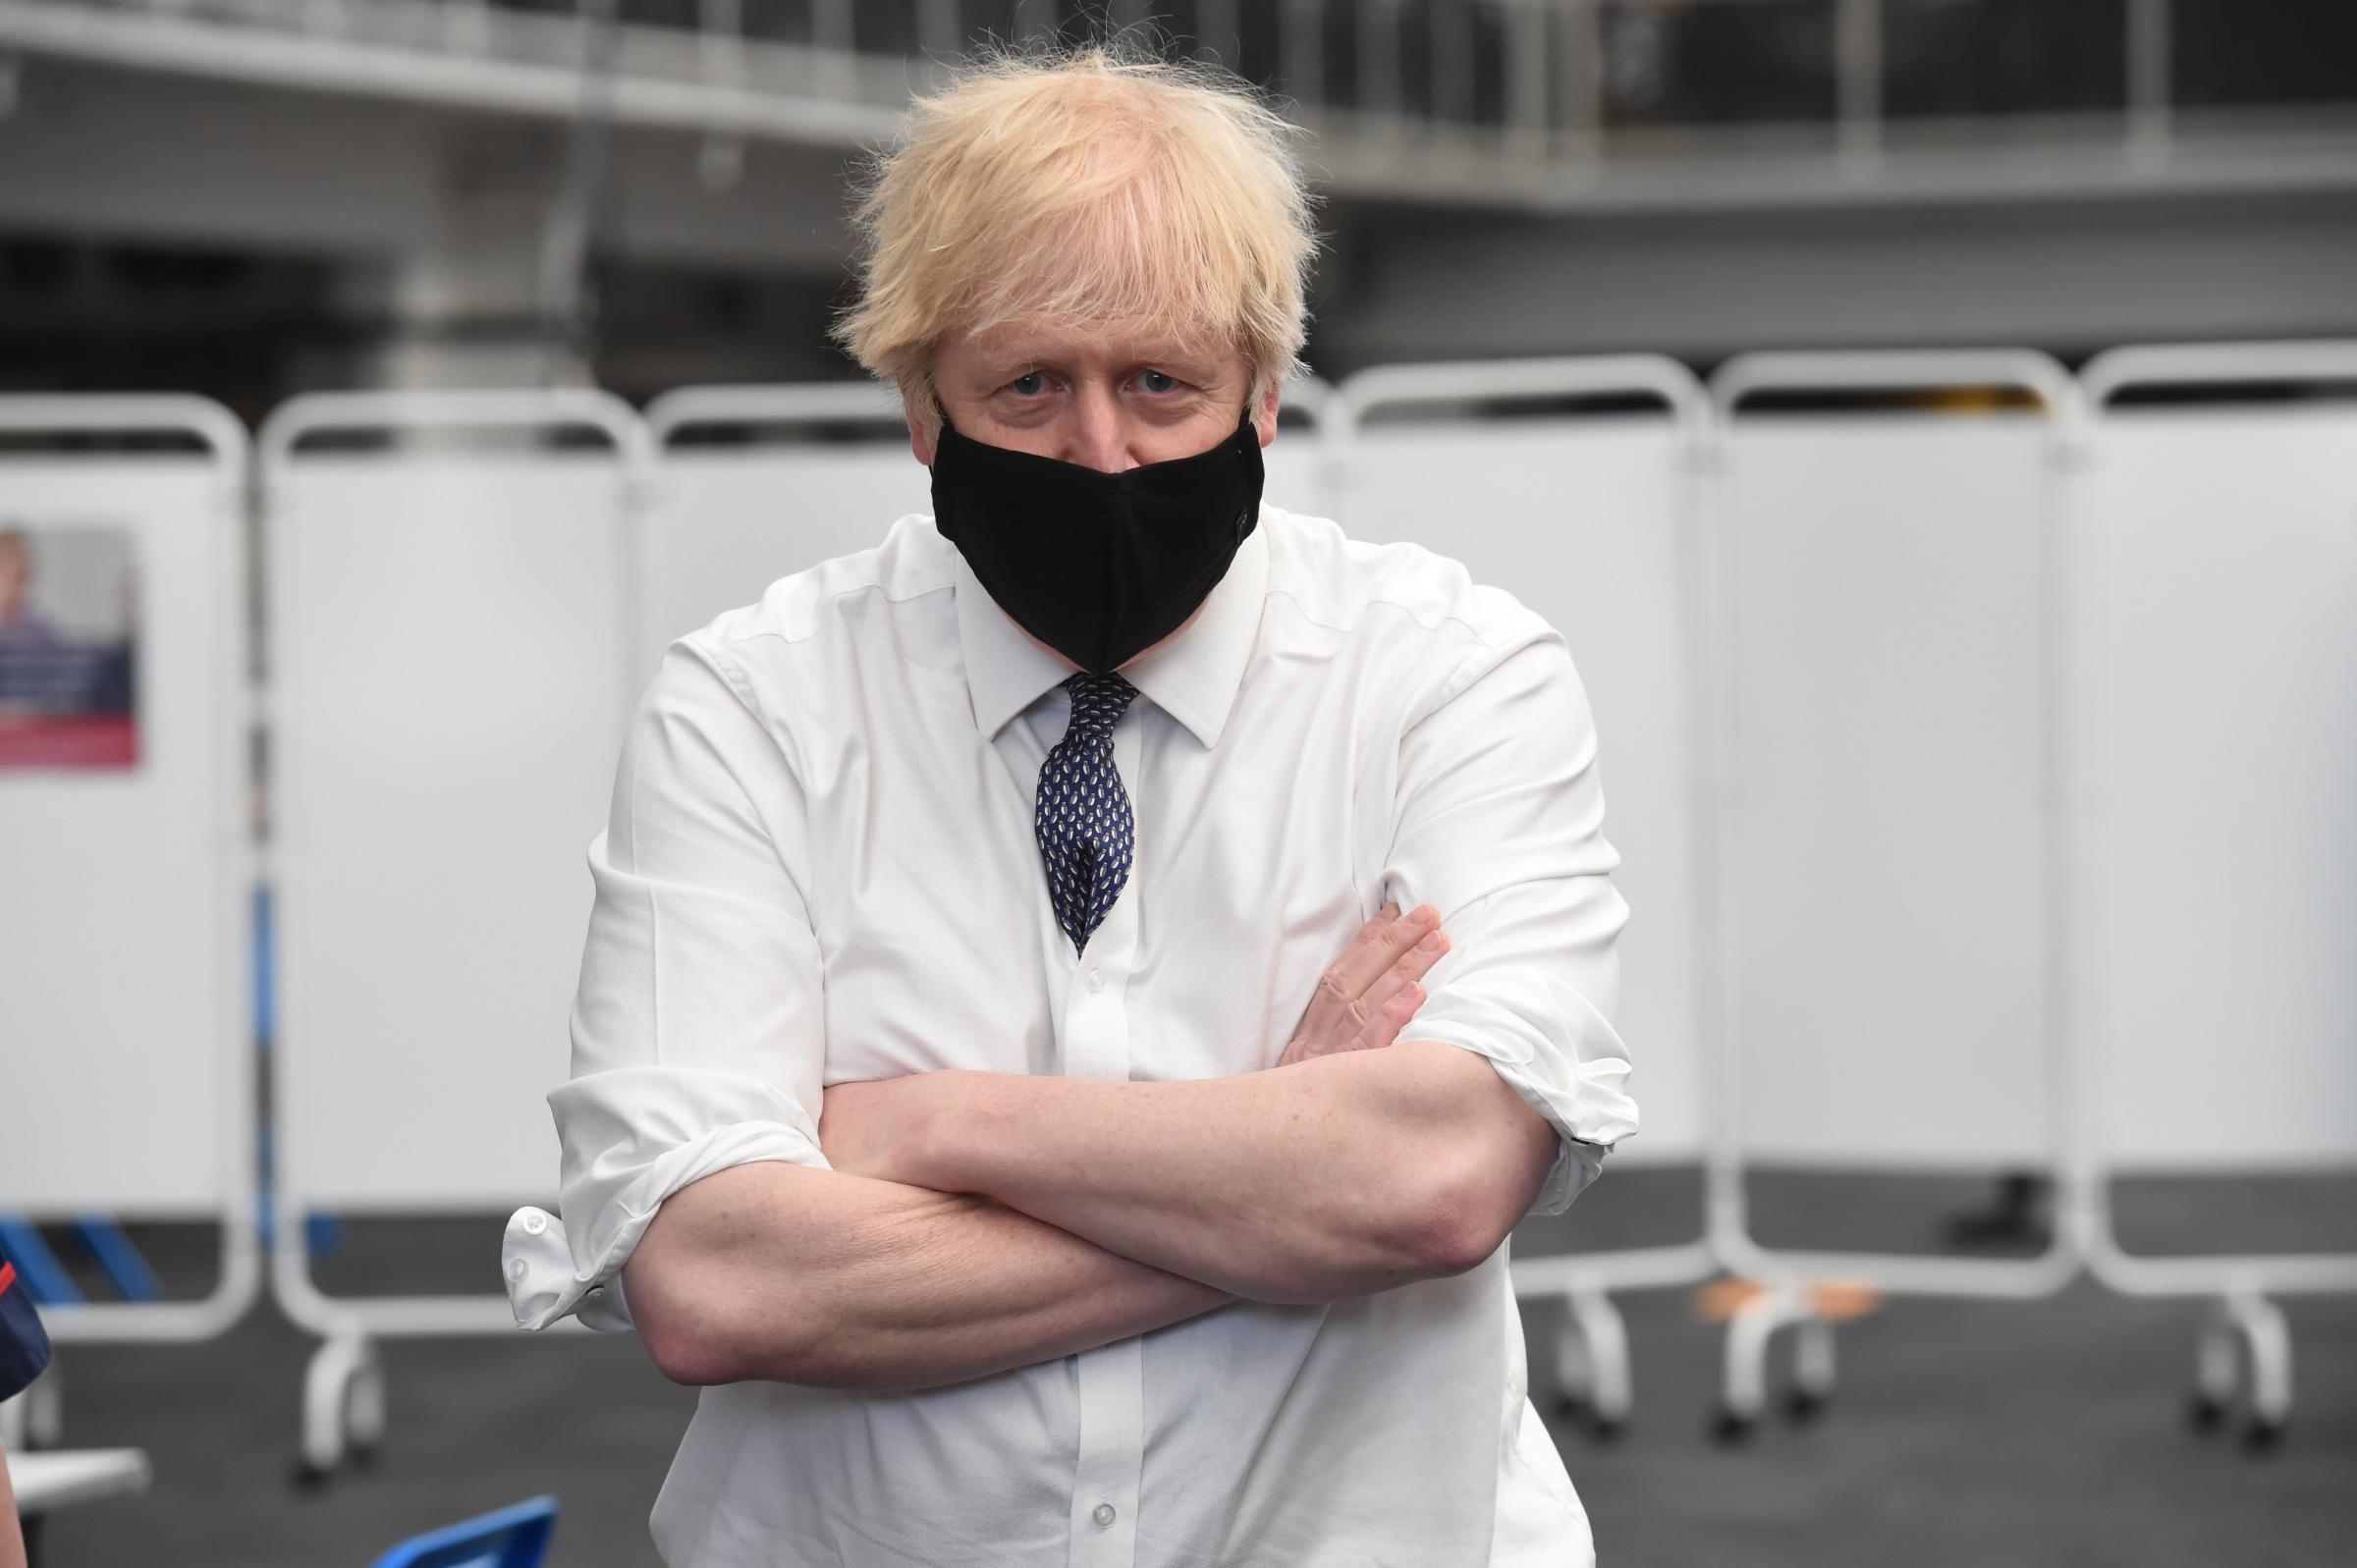 Boris Johnson urged to stand aside on indyref2 as UK voters back mandate